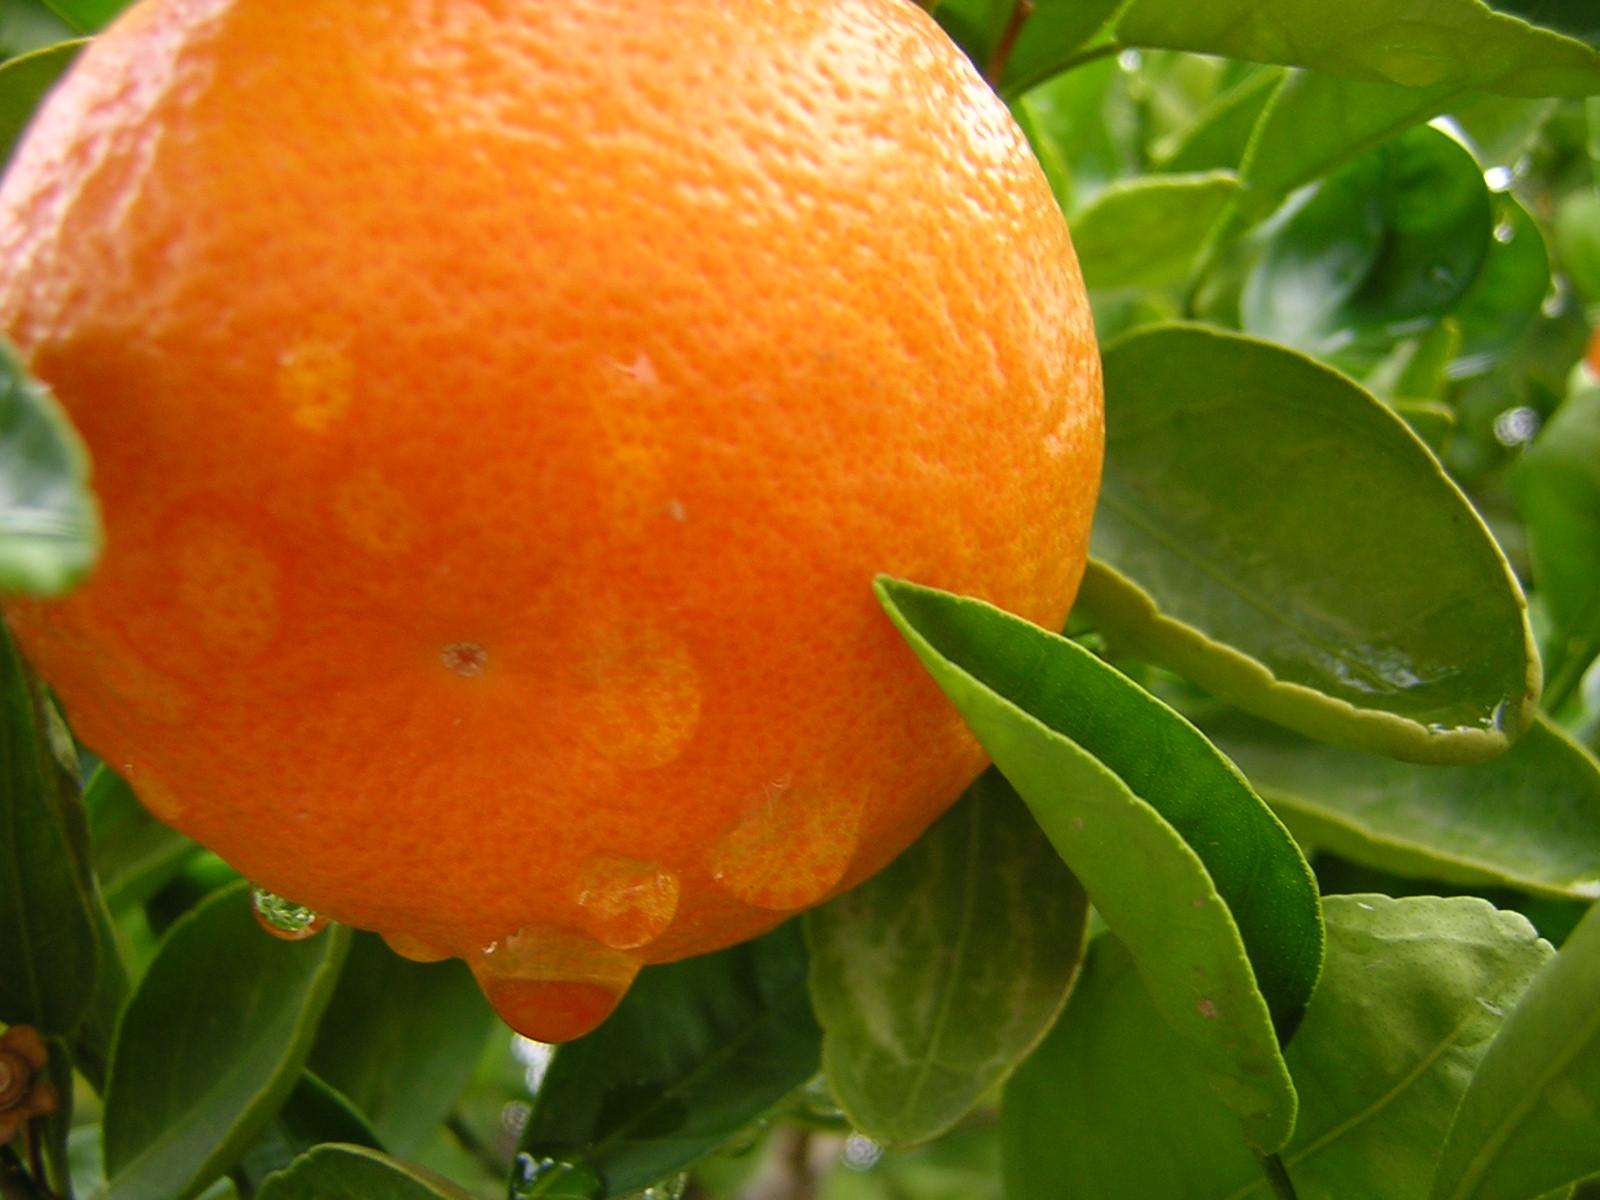 Rain drops on oranges photo